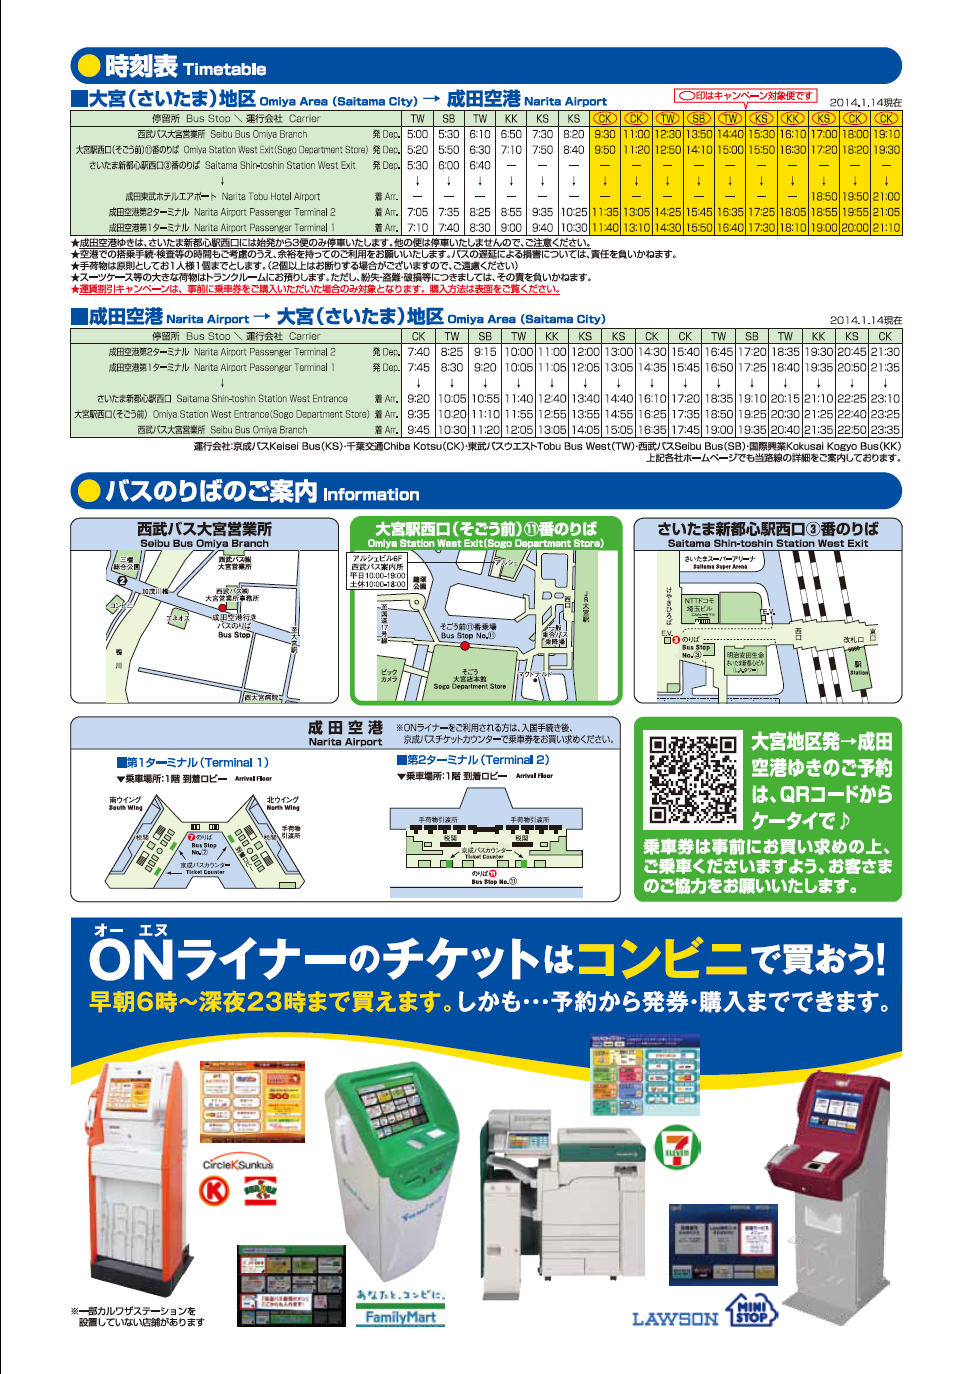 http://5931bus.com/kosoku/20140114onliner.pdf